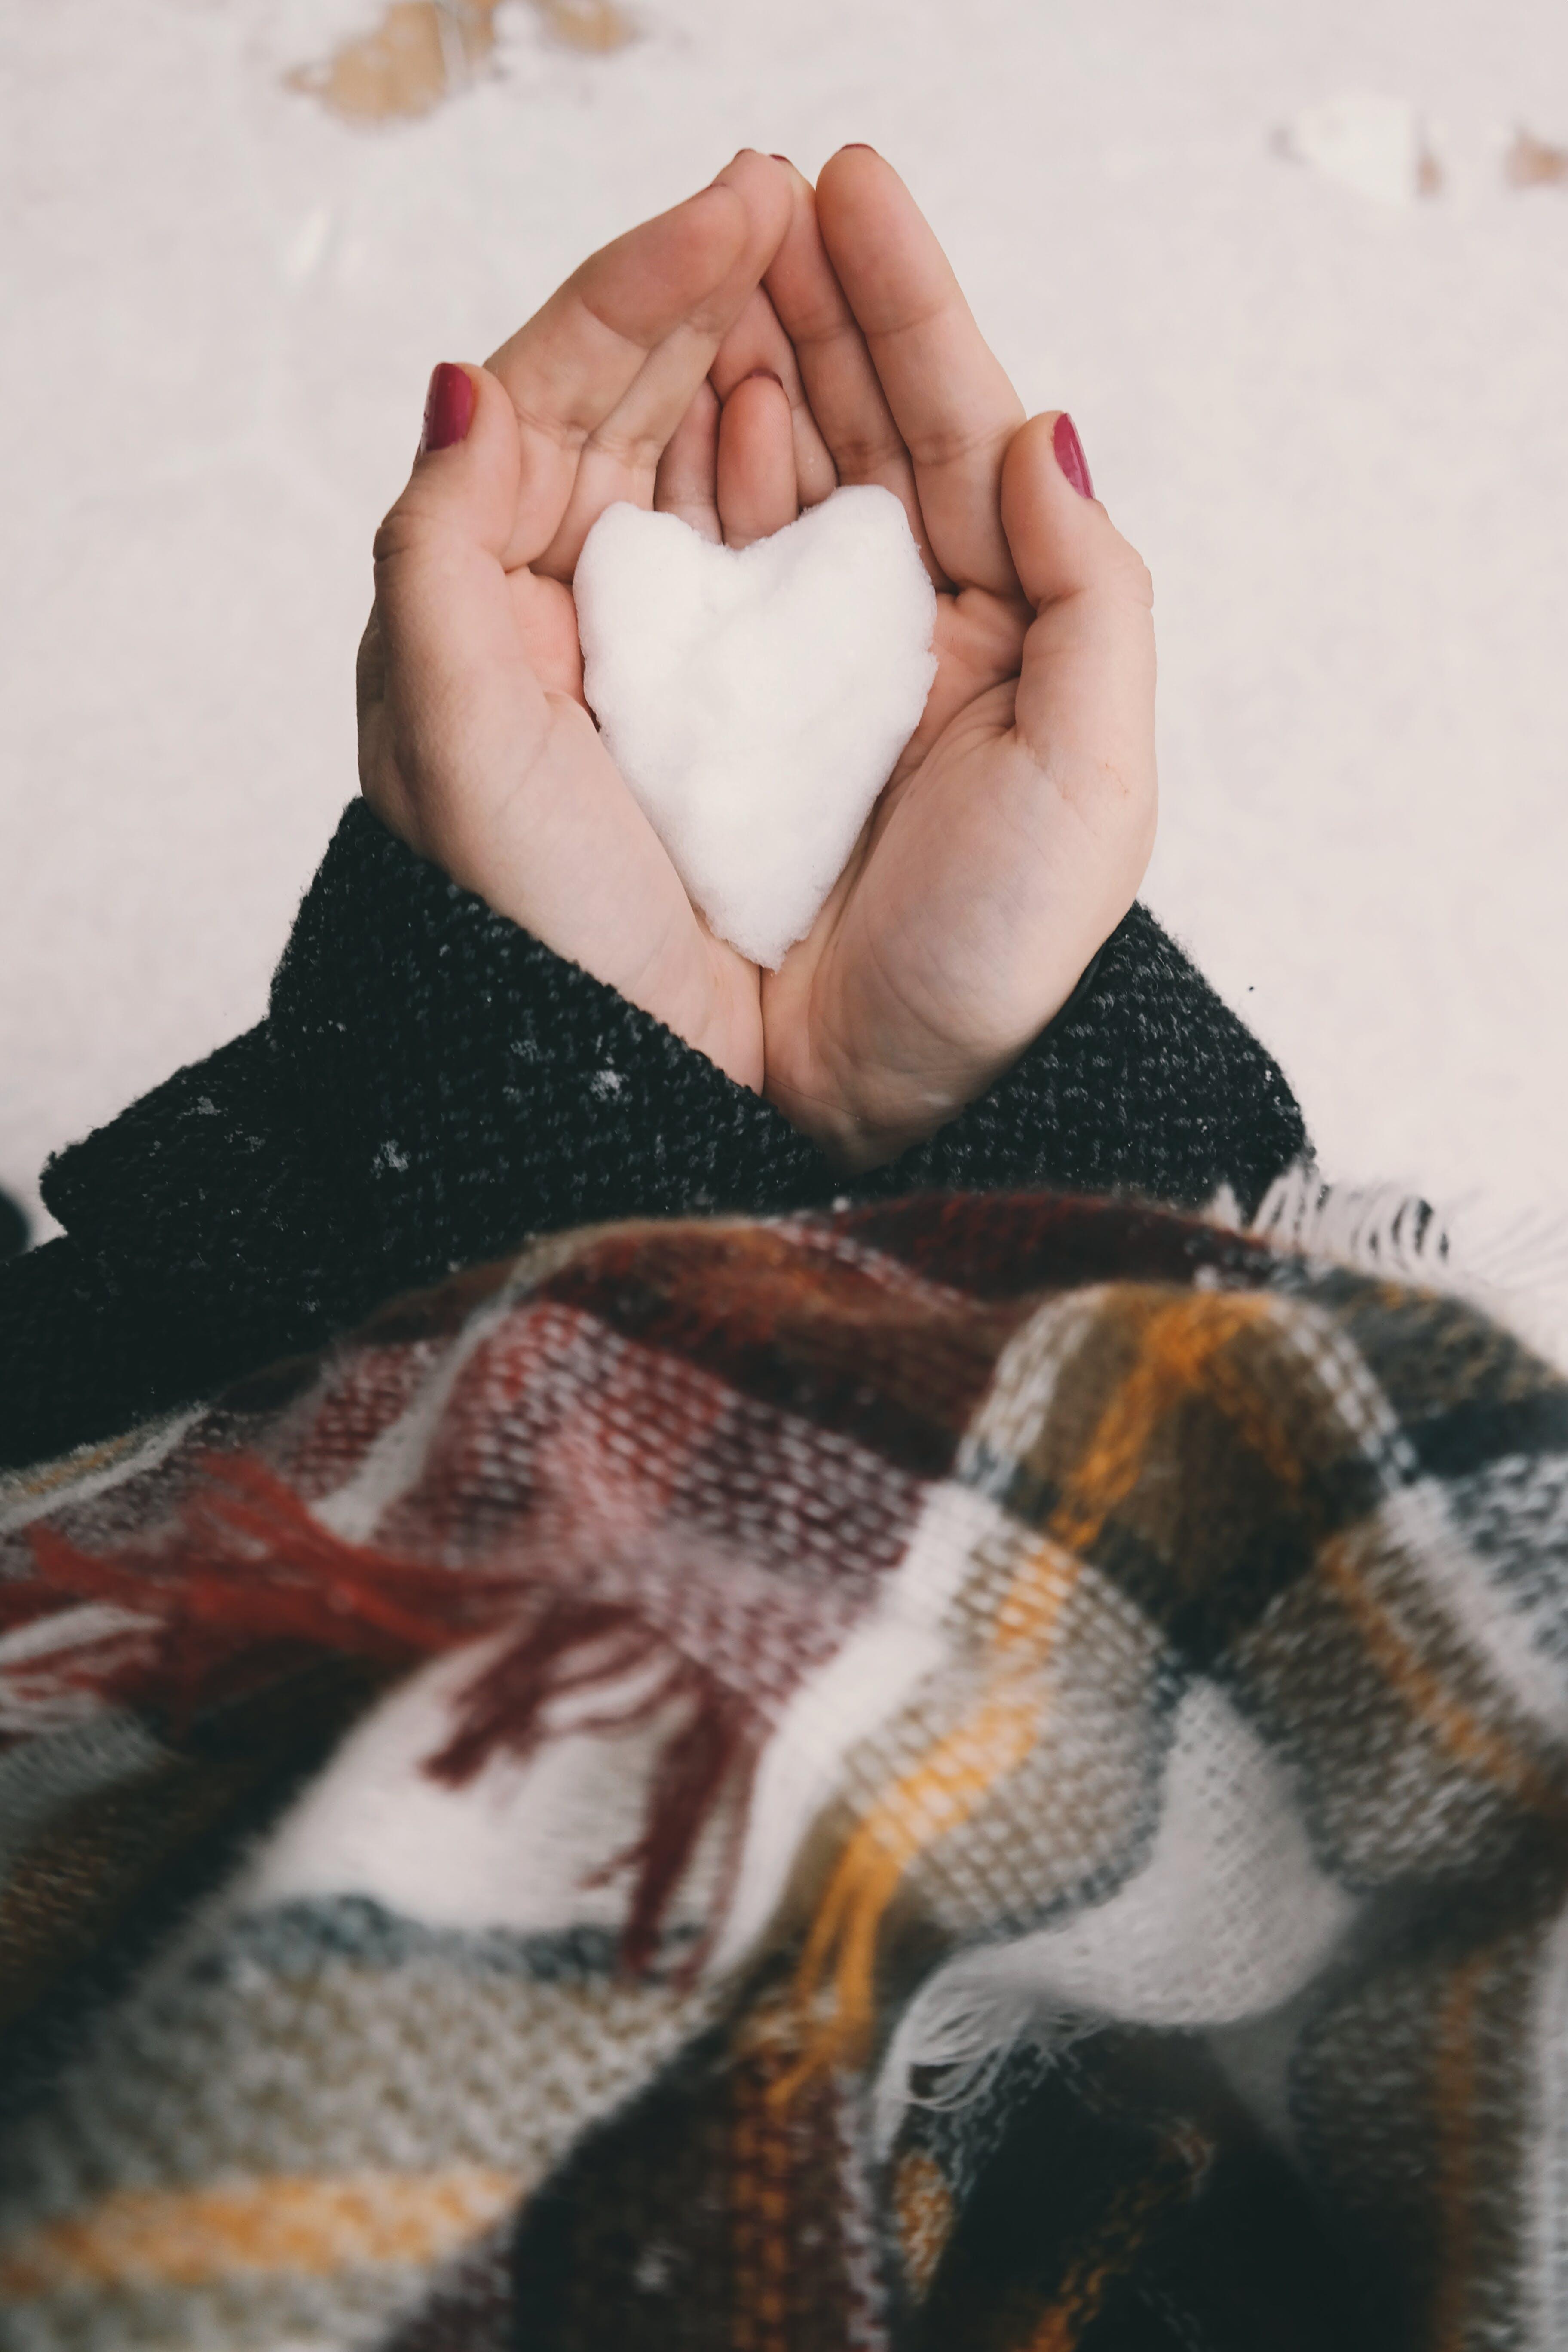 Person Holding White Heart Decor